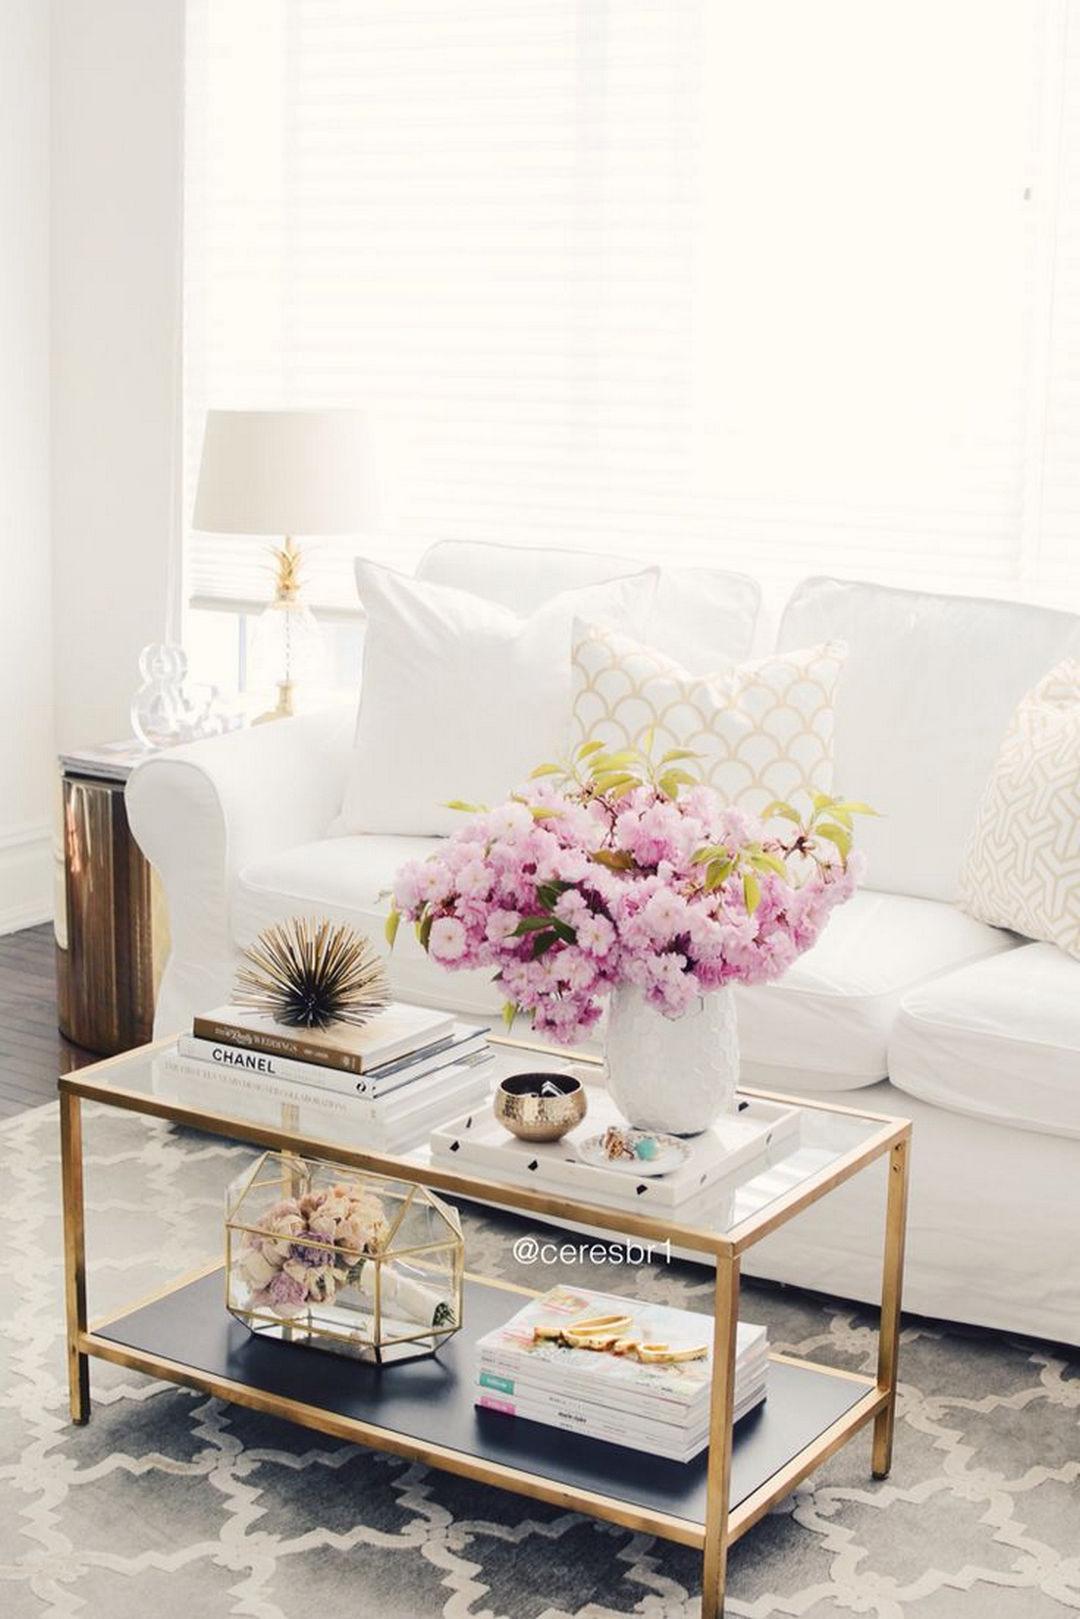 7 Home Decor Ideas For Your Living Room Coffe Table Decor Coffee Table Living Room Table [ 1619 x 1080 Pixel ]